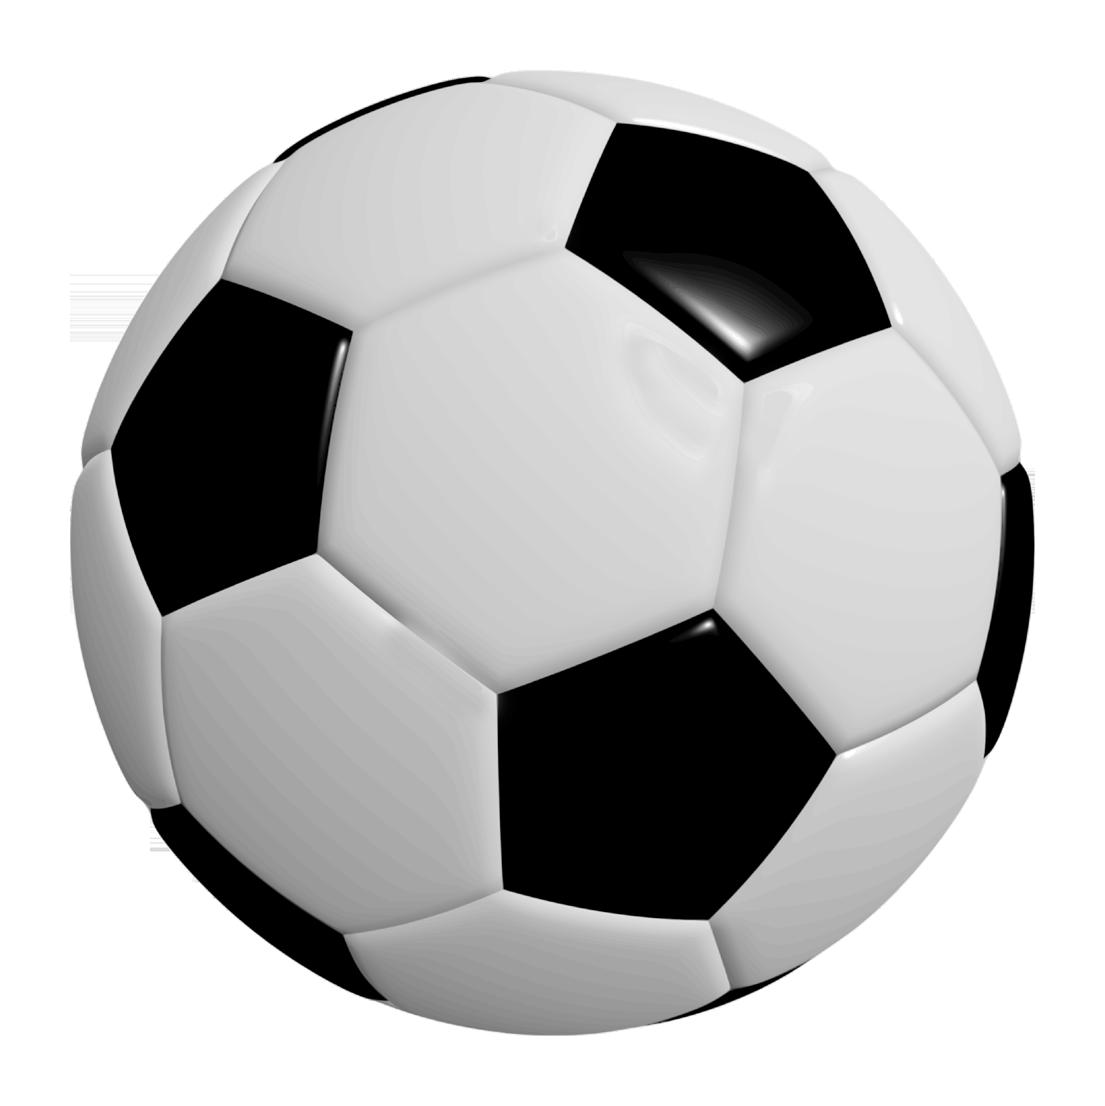 Clipart Fußball